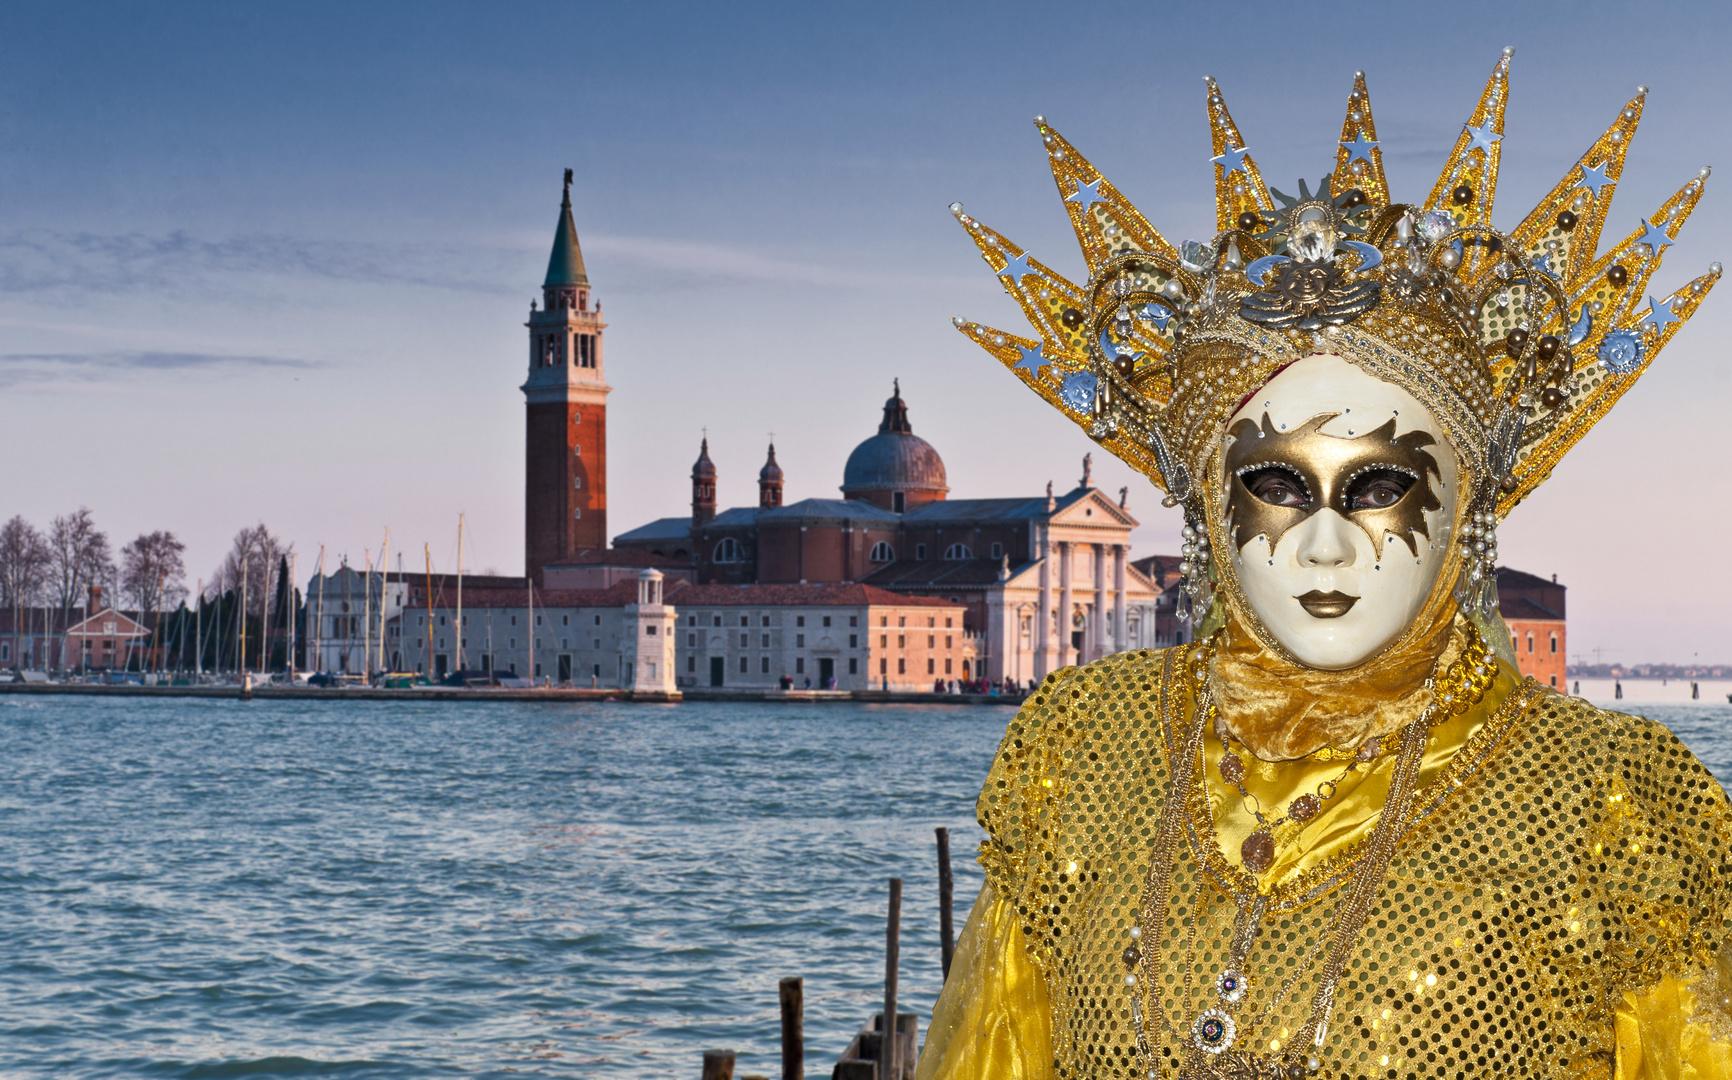 Carnevale venecia 2012